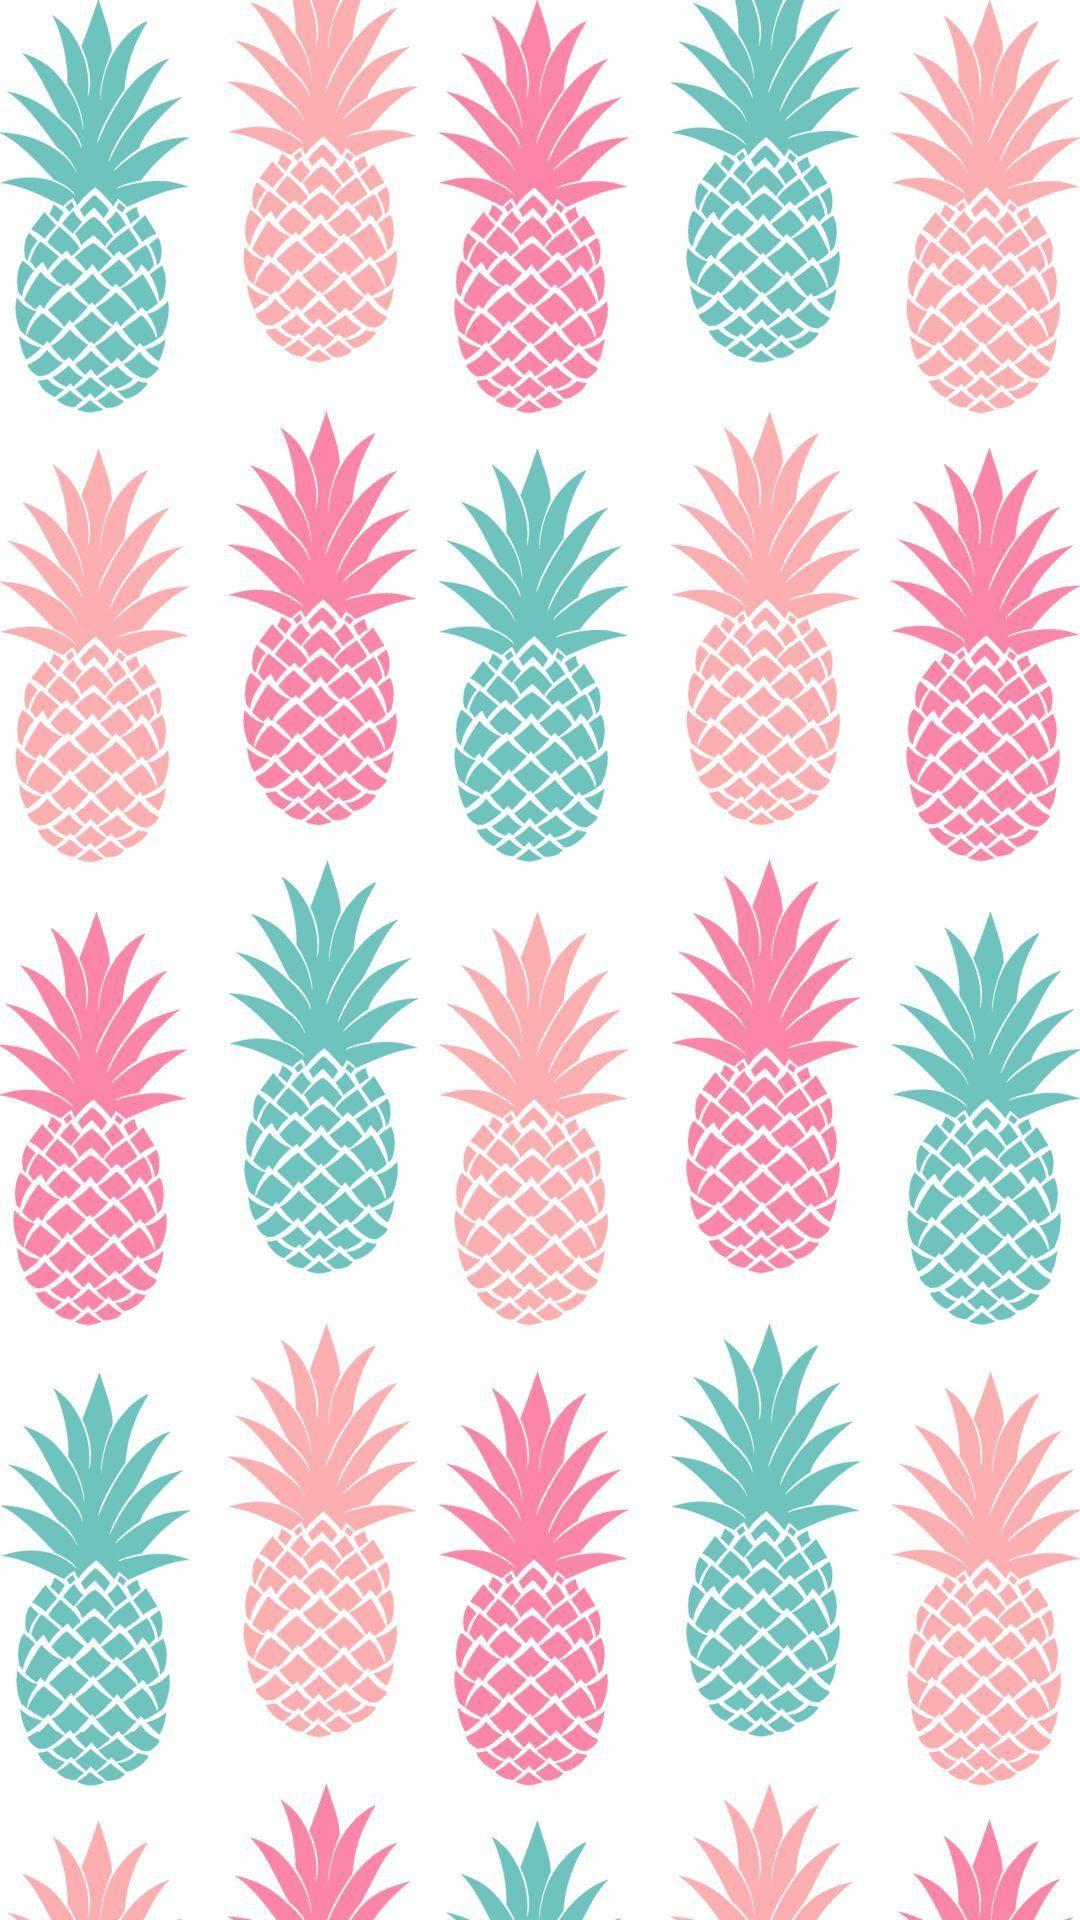 Rose Gold Cute Pineapple Image Pineapple Wallpaper Iphone Wallpaper Pineapple Pineapple Backgrounds